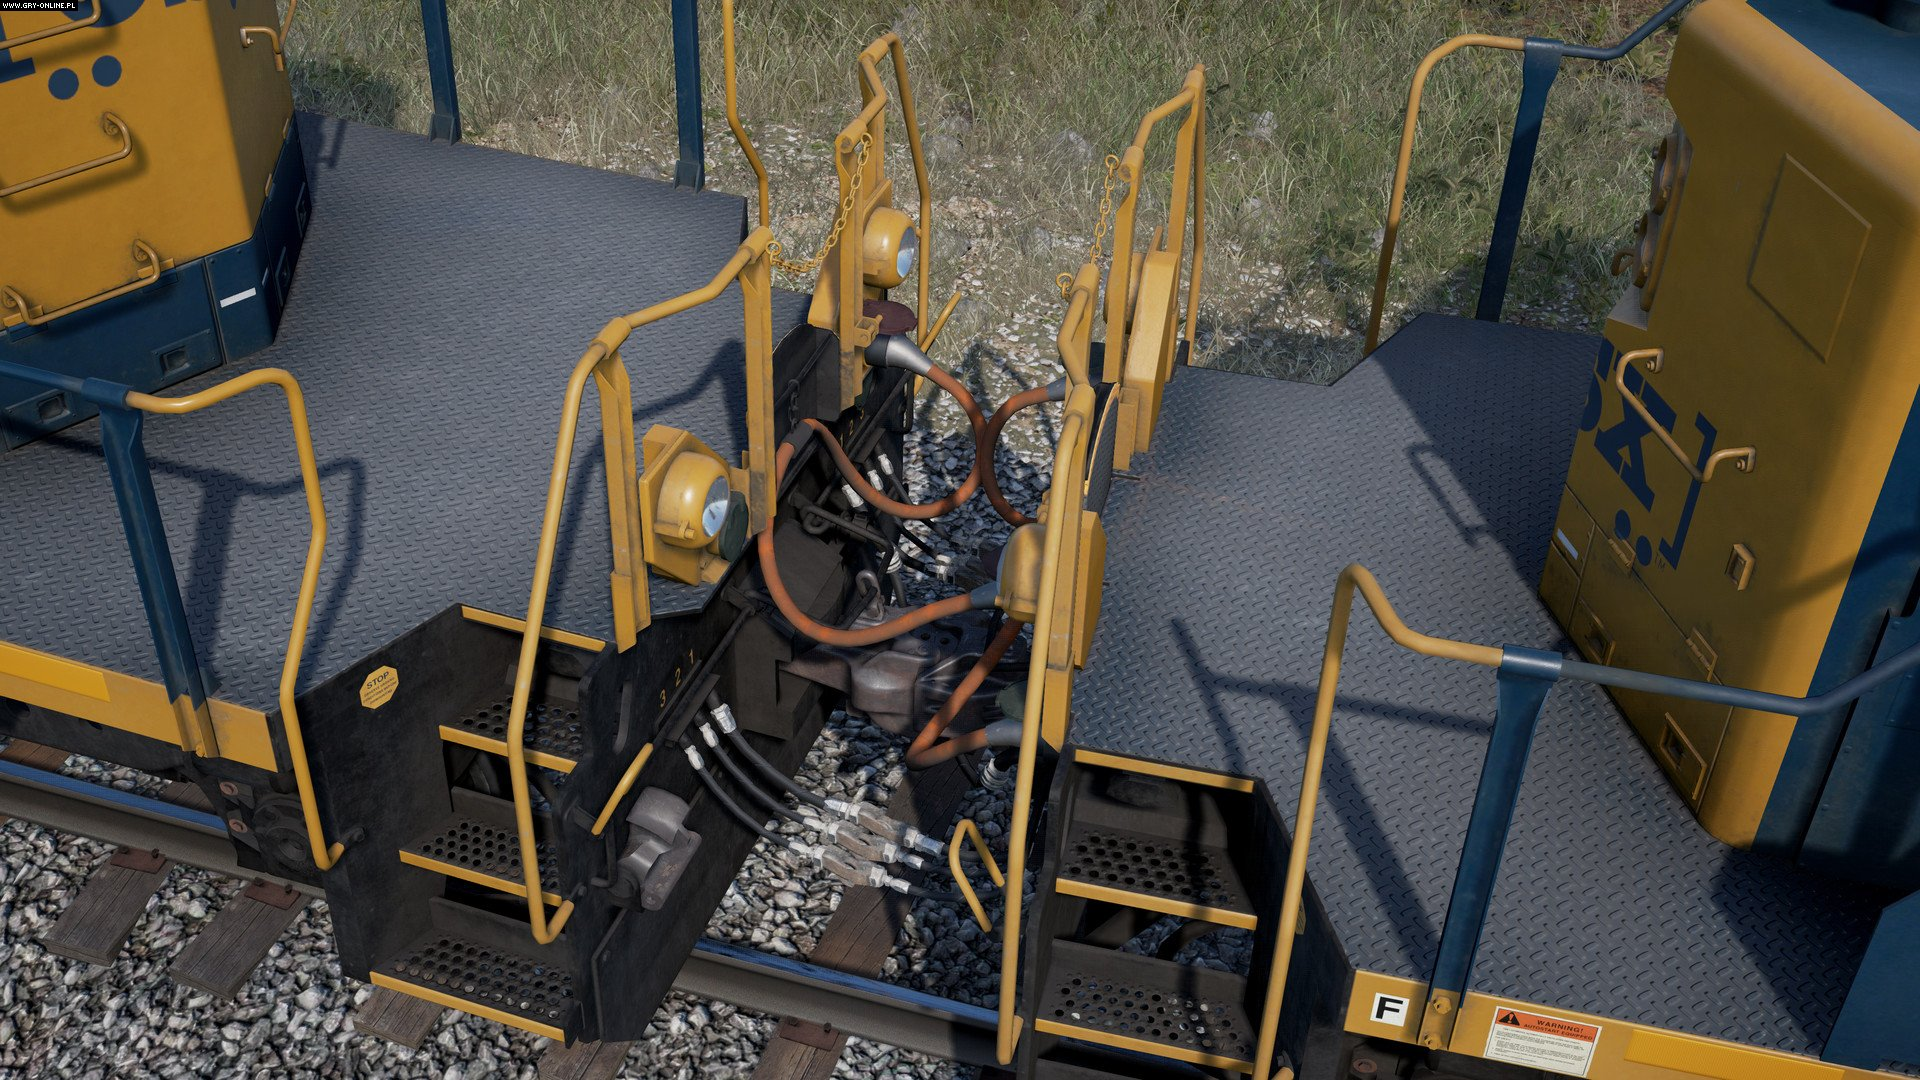 Train Sim World: CSX Heavy Haul PC, XONE Games Image 3/8, Dovetail Games/Rail Simulator Developments